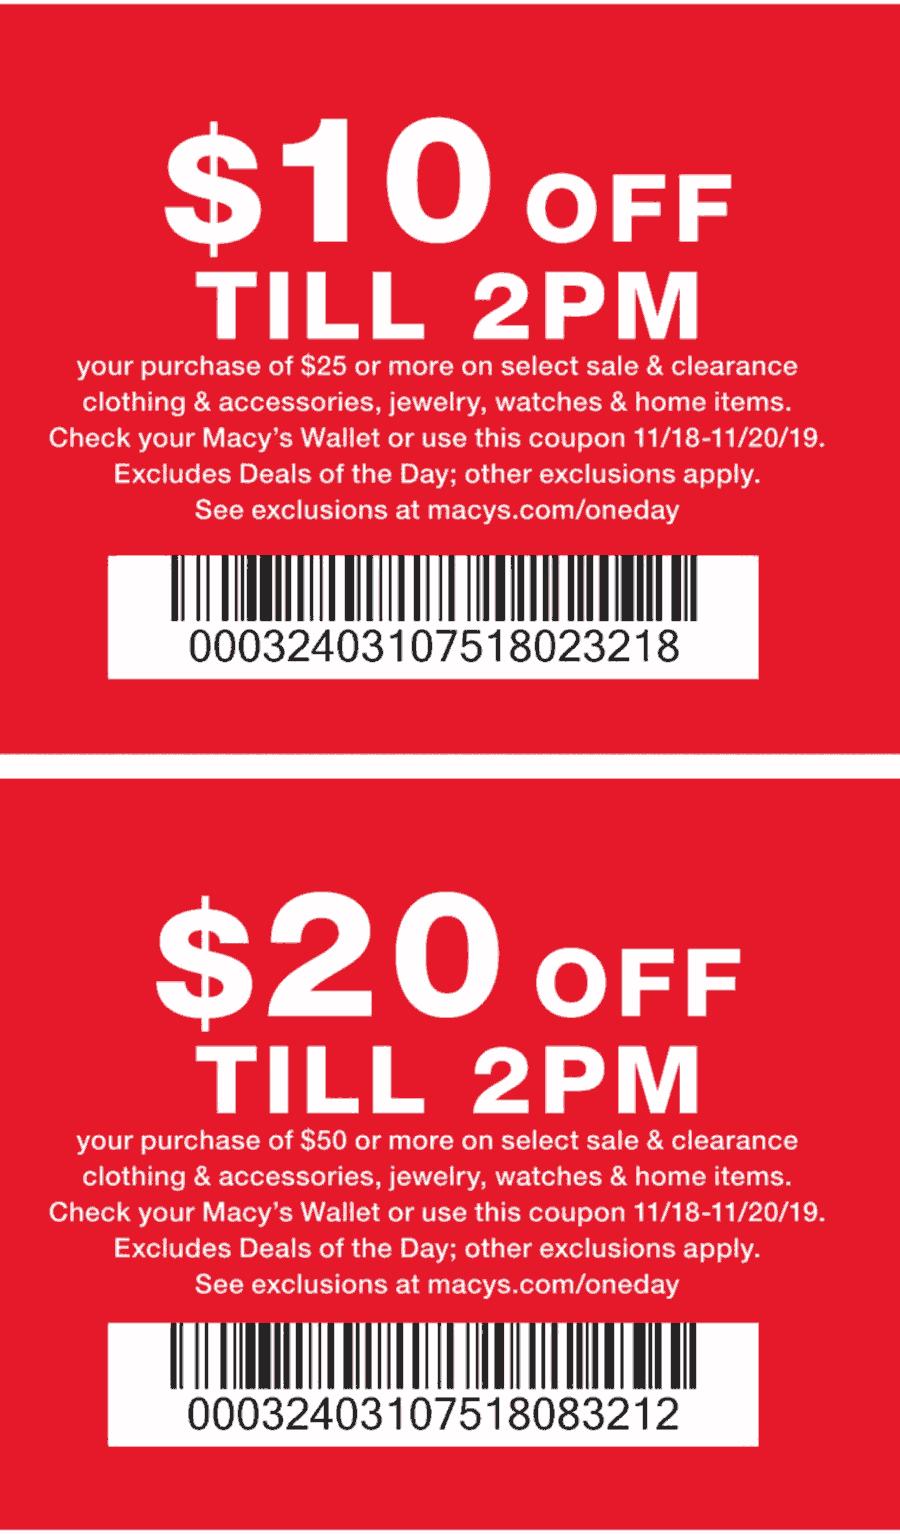 Macys Coupon December 2019 $10 off $25 & more 18-20th at Macys